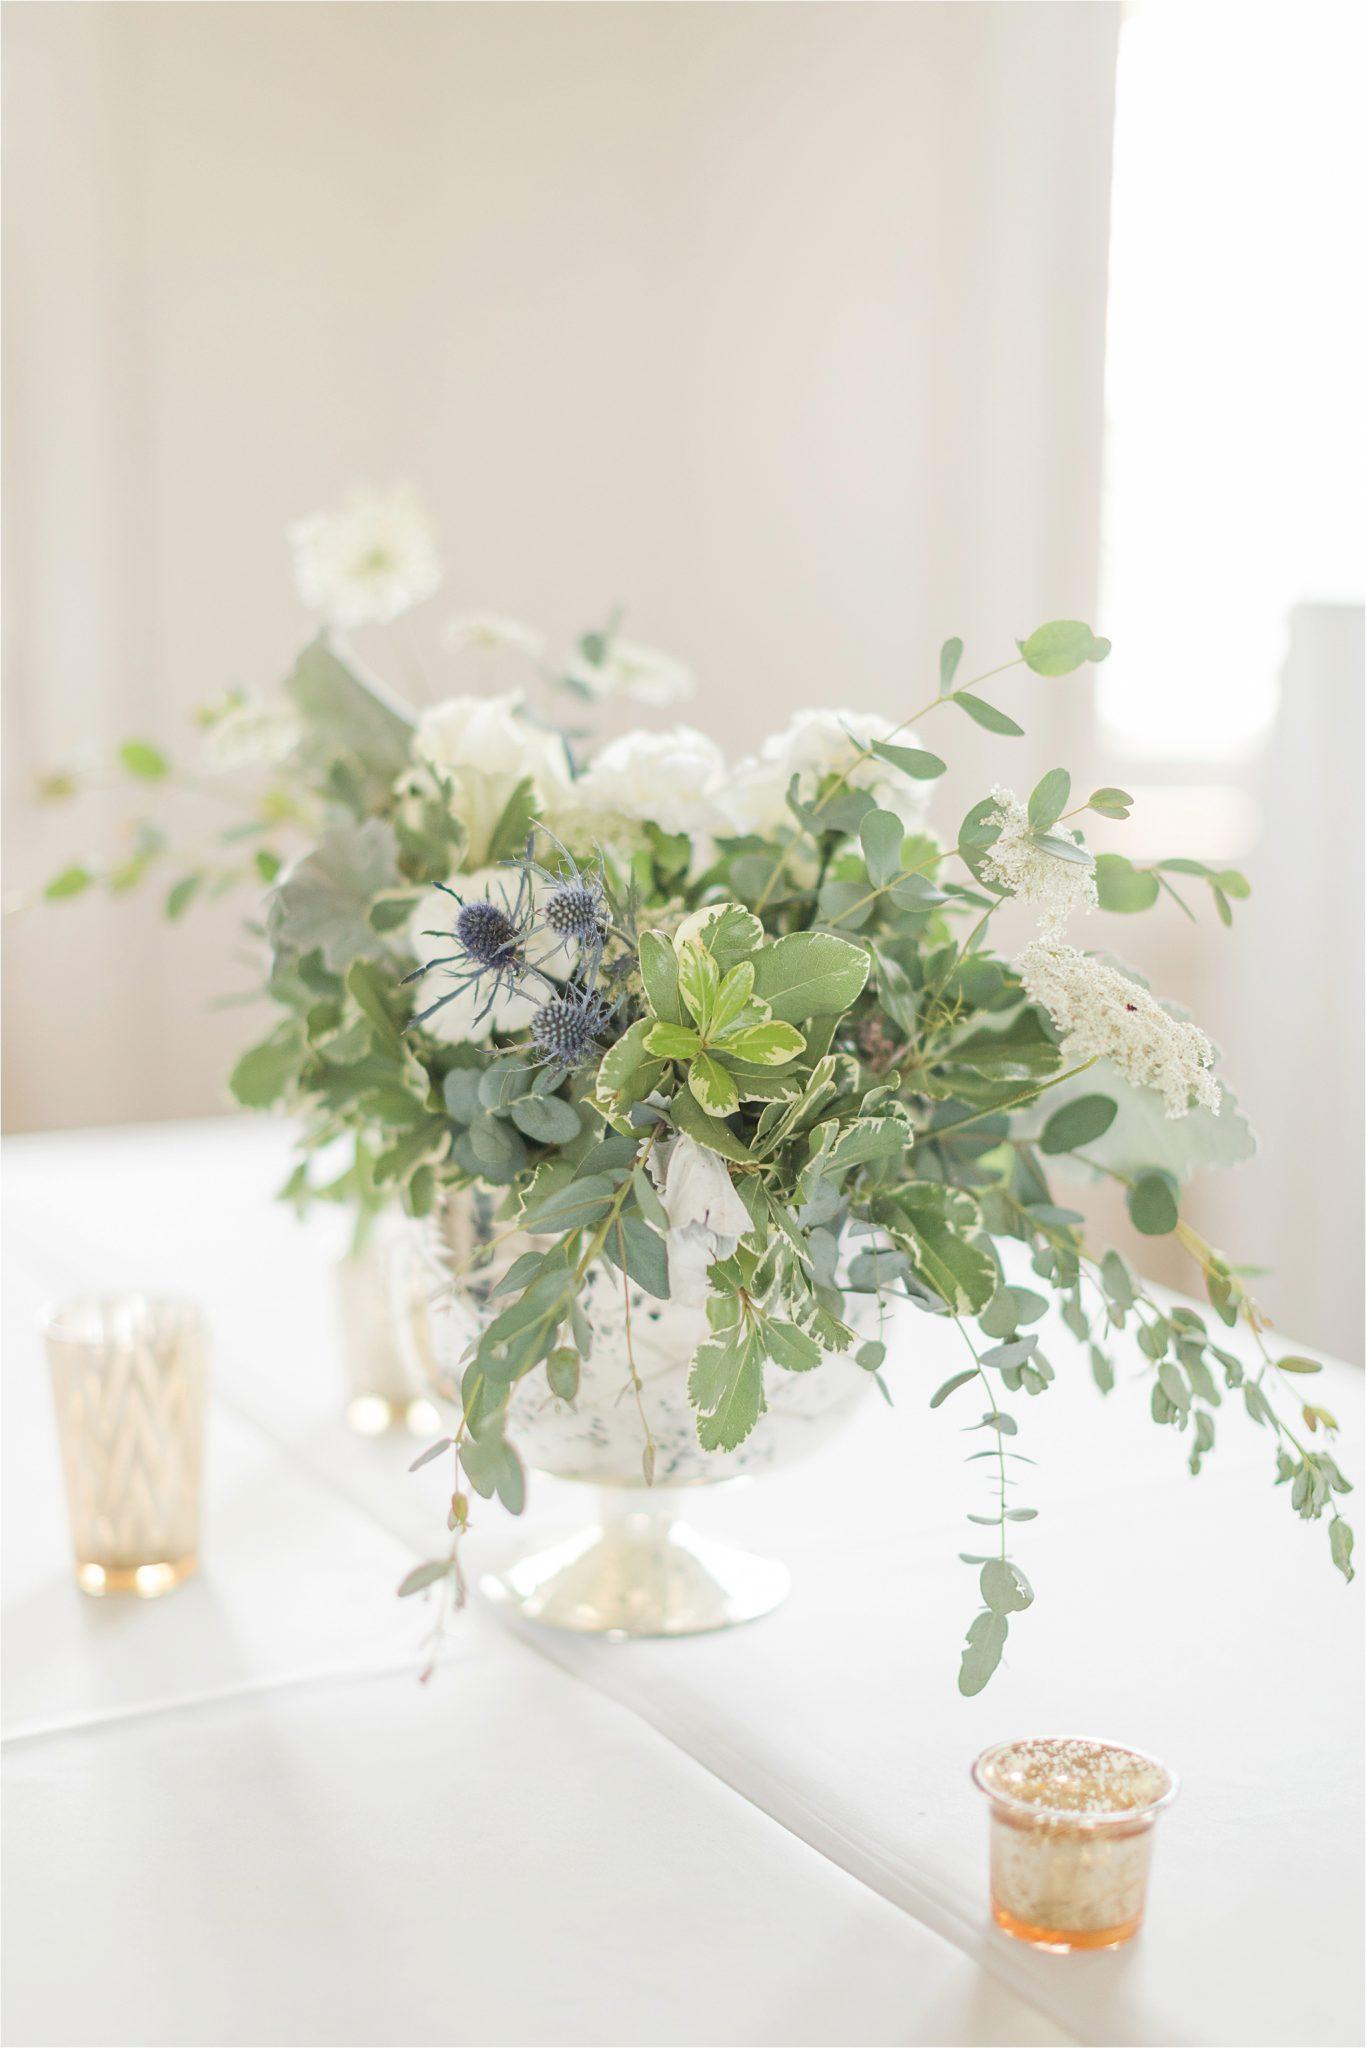 Pastel Themed Wedding-The Chapel at the Waters-Montgomery Alabama Photographer-Miles & Meredyth-Blue Themed Wedding-Alabama Wedding Venue-Wedding Details-Wedding Flower Arrangements-Wedding Table Arrangements